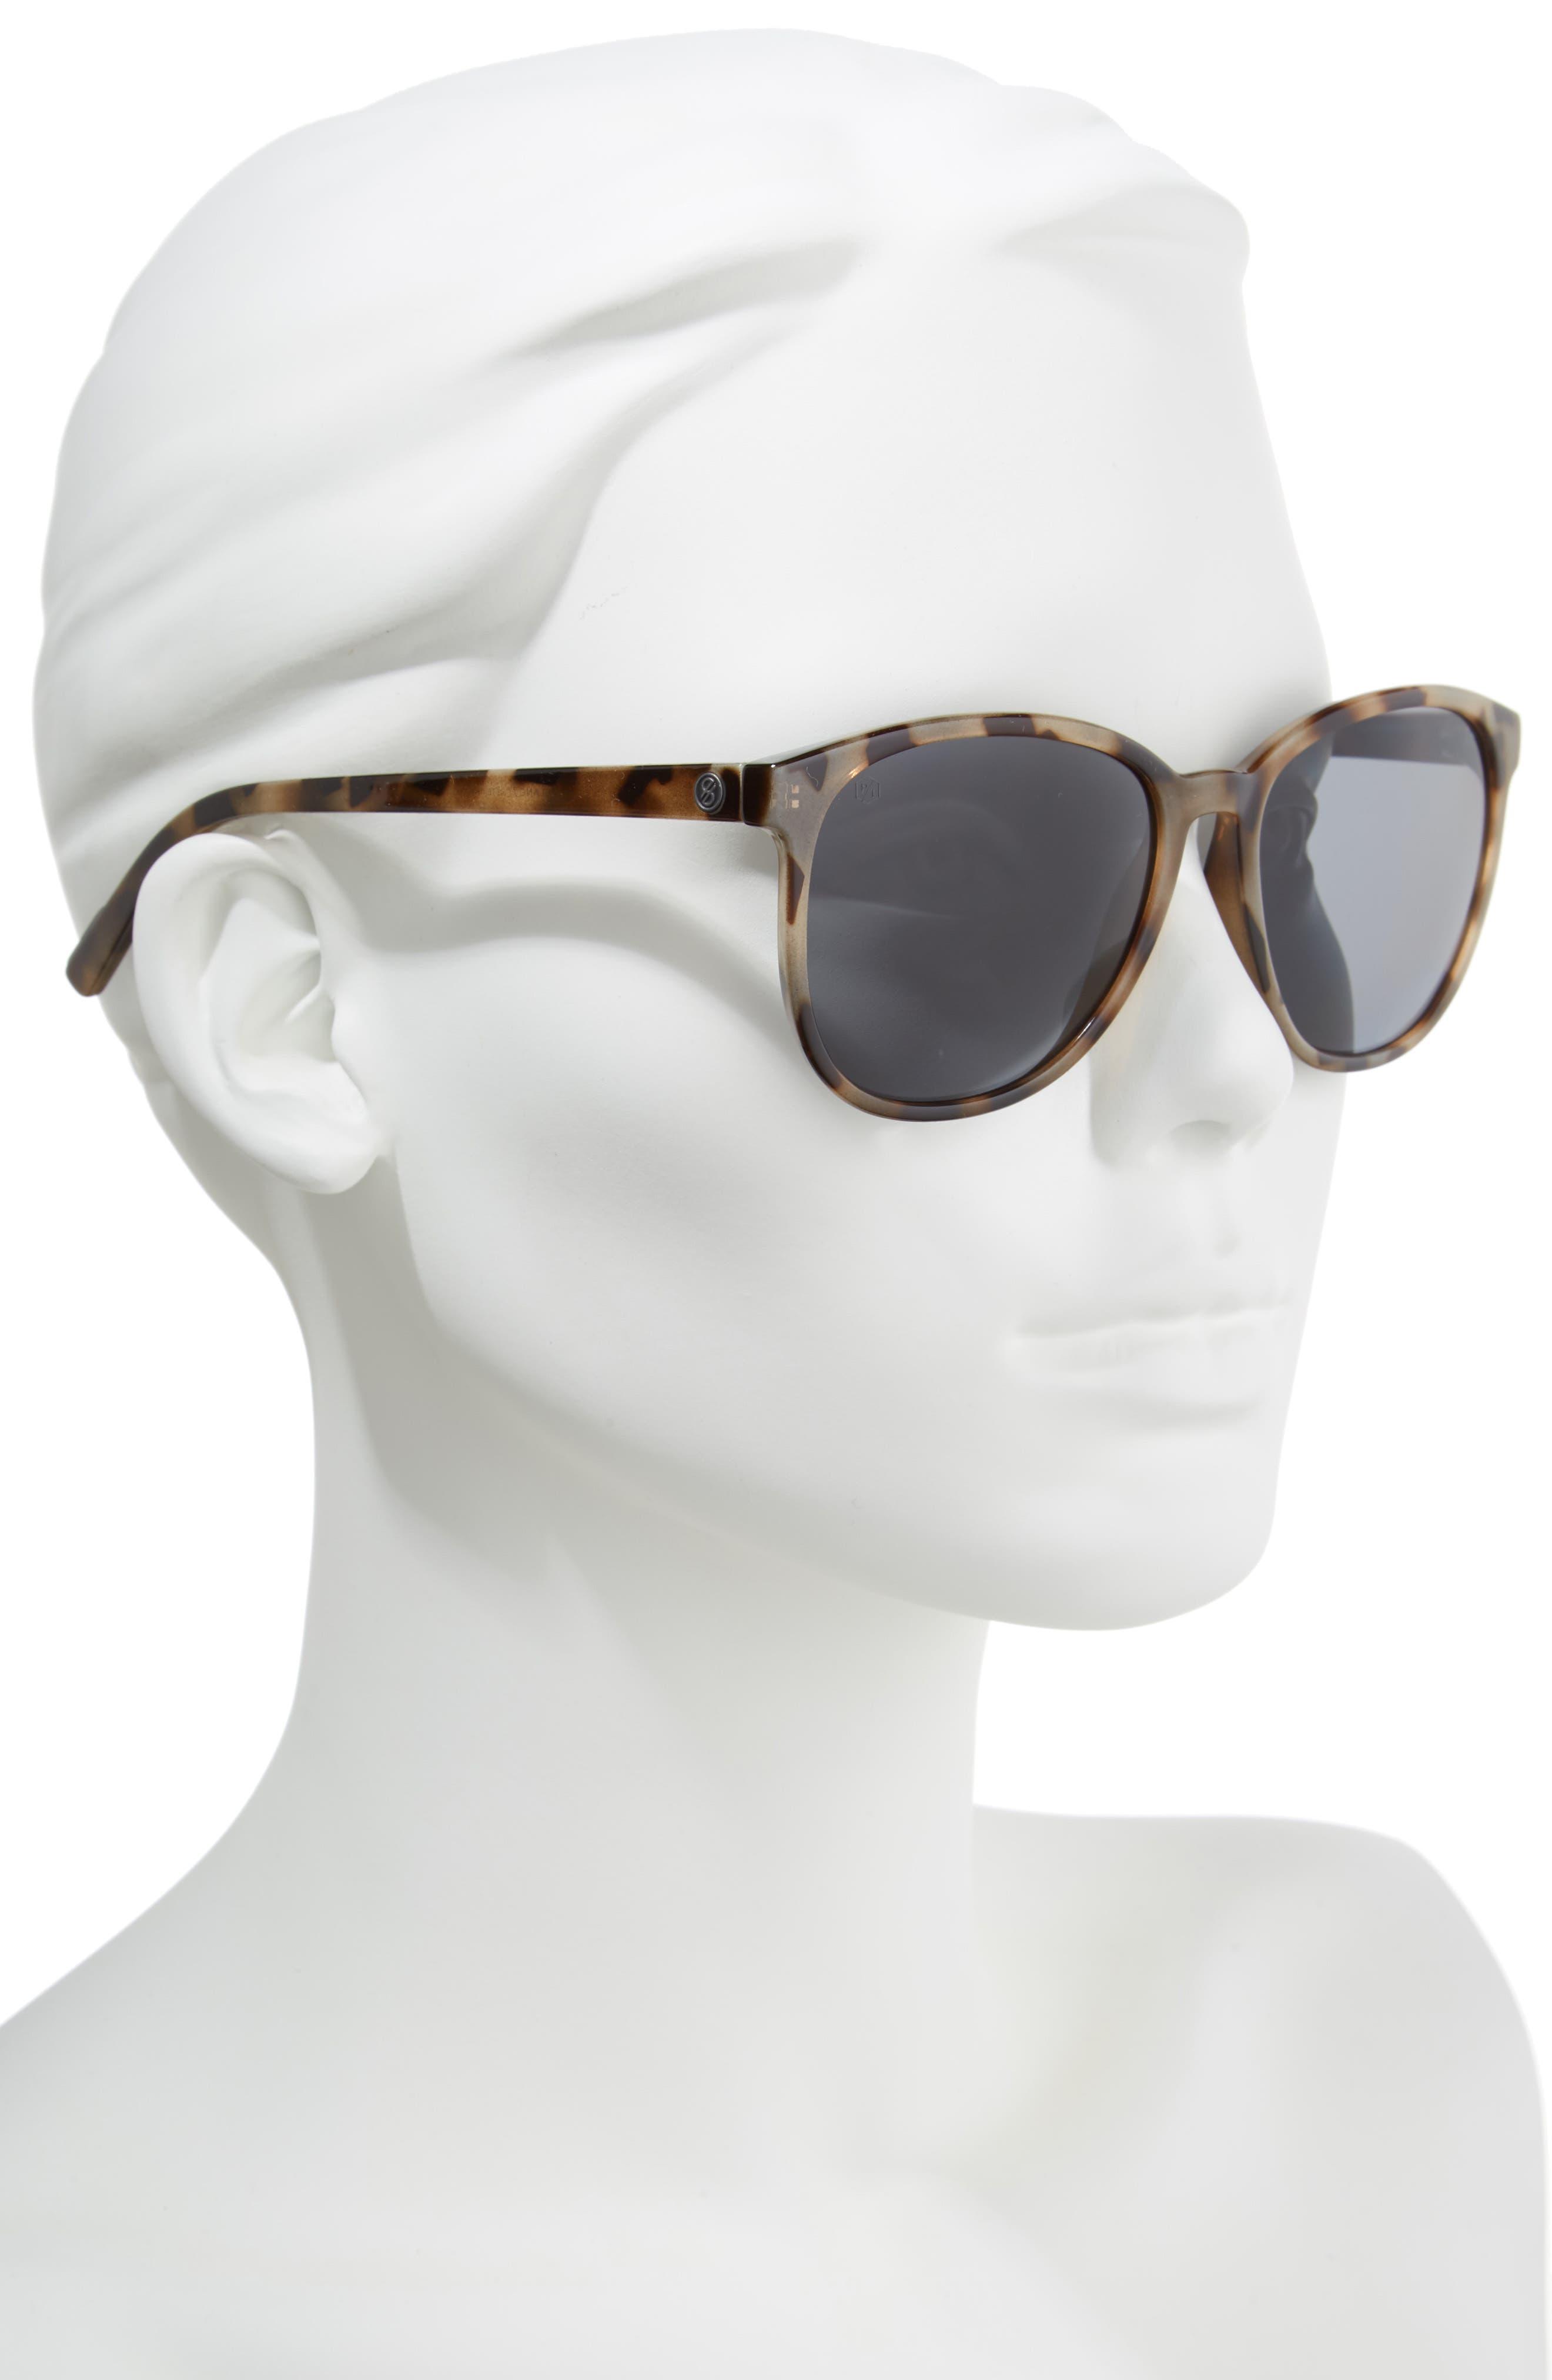 D'BLANC Afternoon Delight 56mm Polarized Sunglasses,                             Alternate thumbnail 2, color,                             SNOW LEOPARD/ GREY POLAR